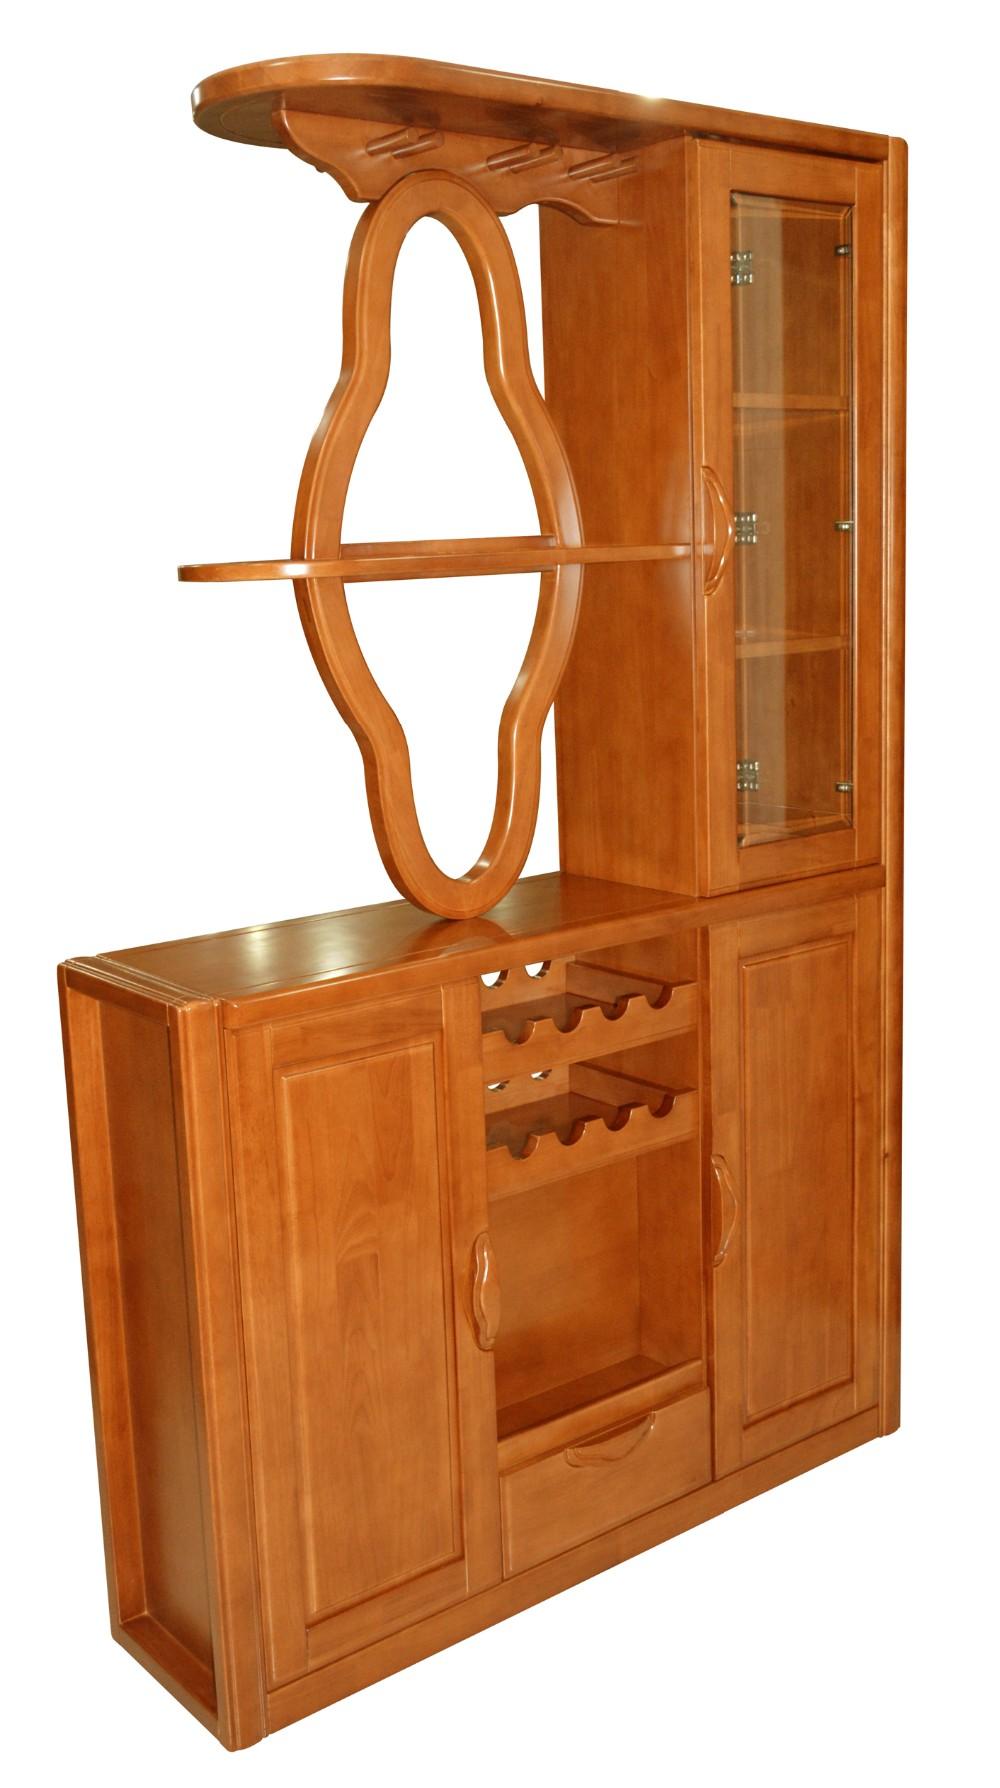 Moderne massief houten meubels woonkamer wijn vitrinekast divider ...